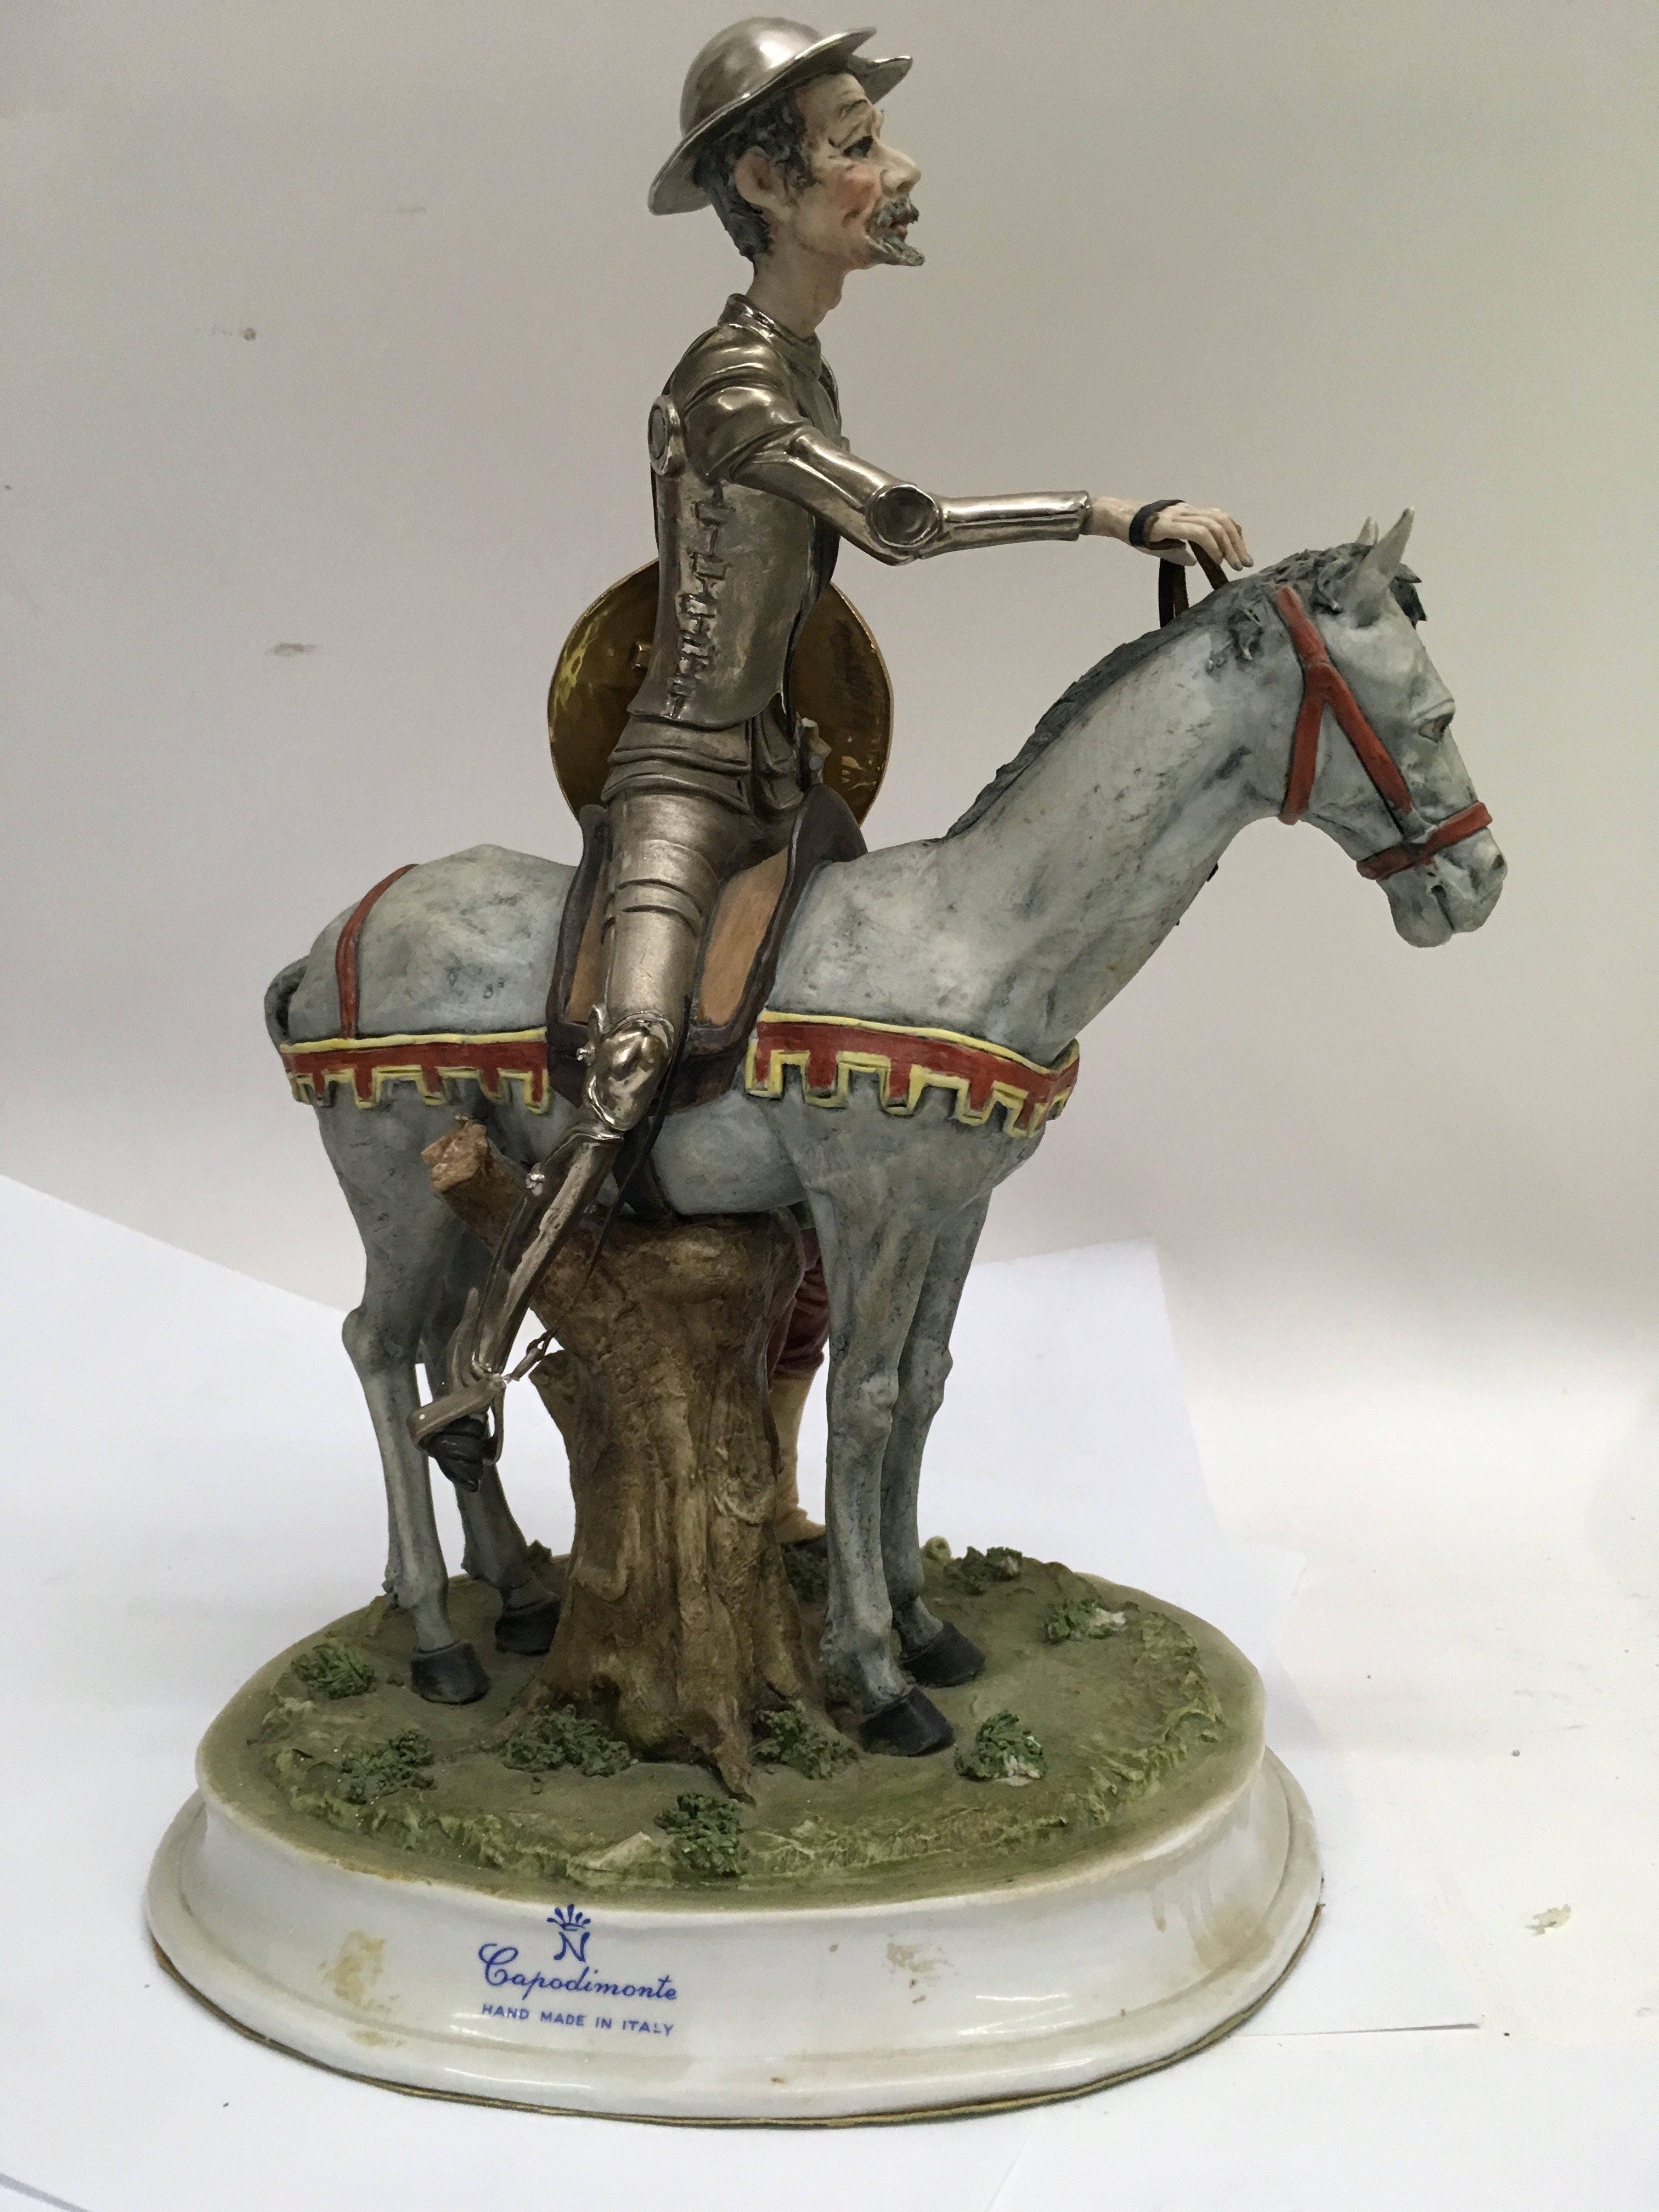 Lot 714 - A capodimonte figure figure on horse back - NO RES